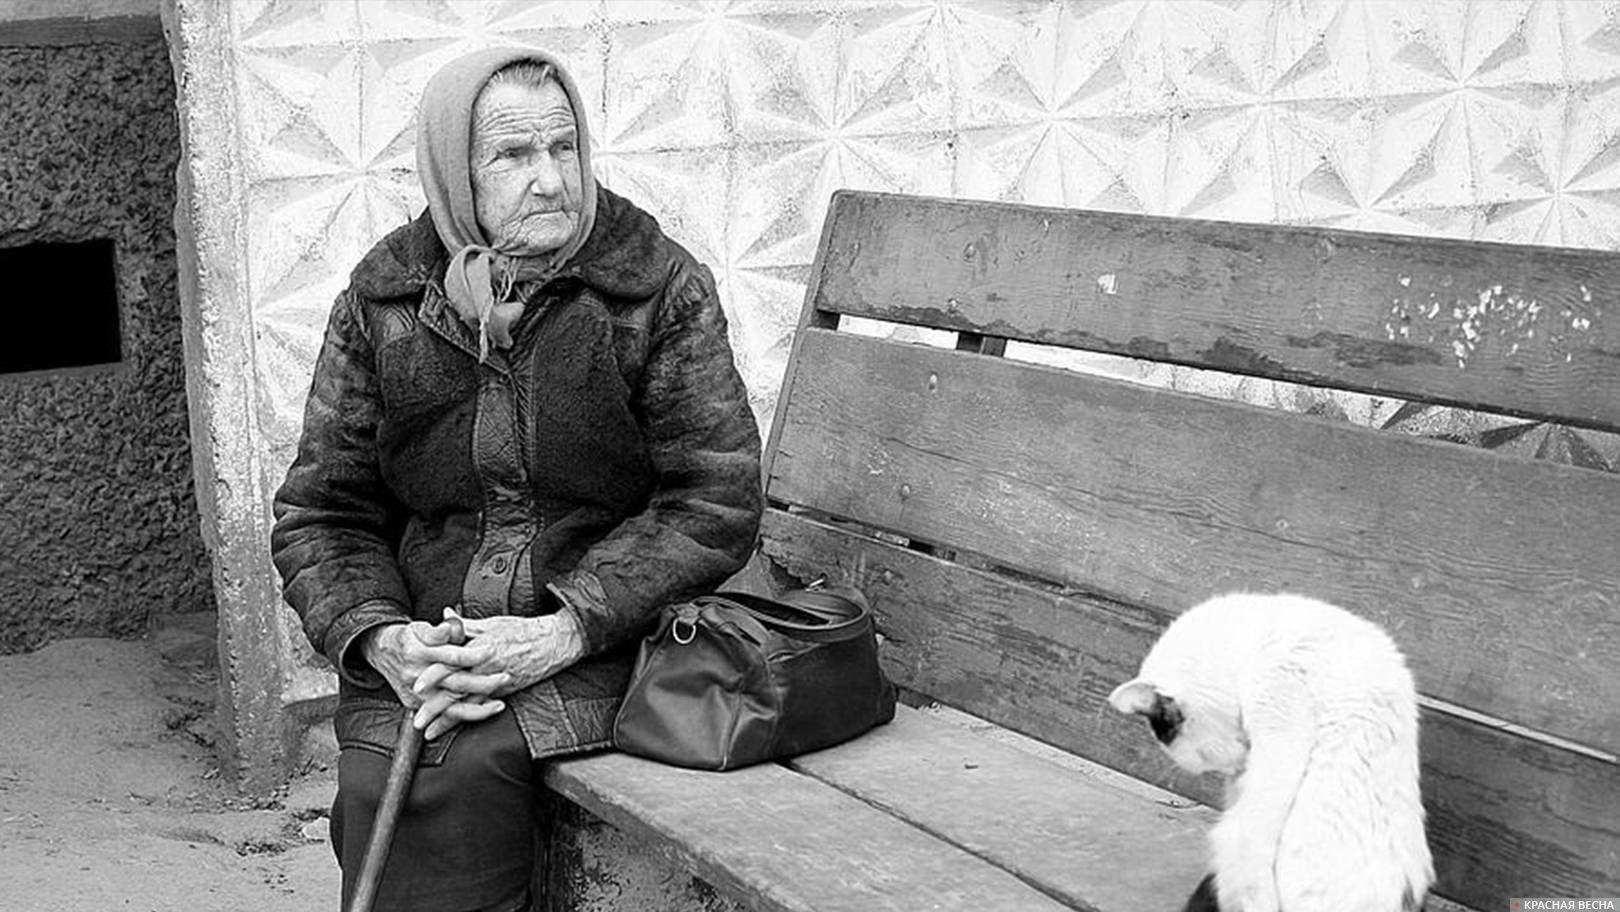 бабушка, кошка, бедность 777jew, pixabay, cc0